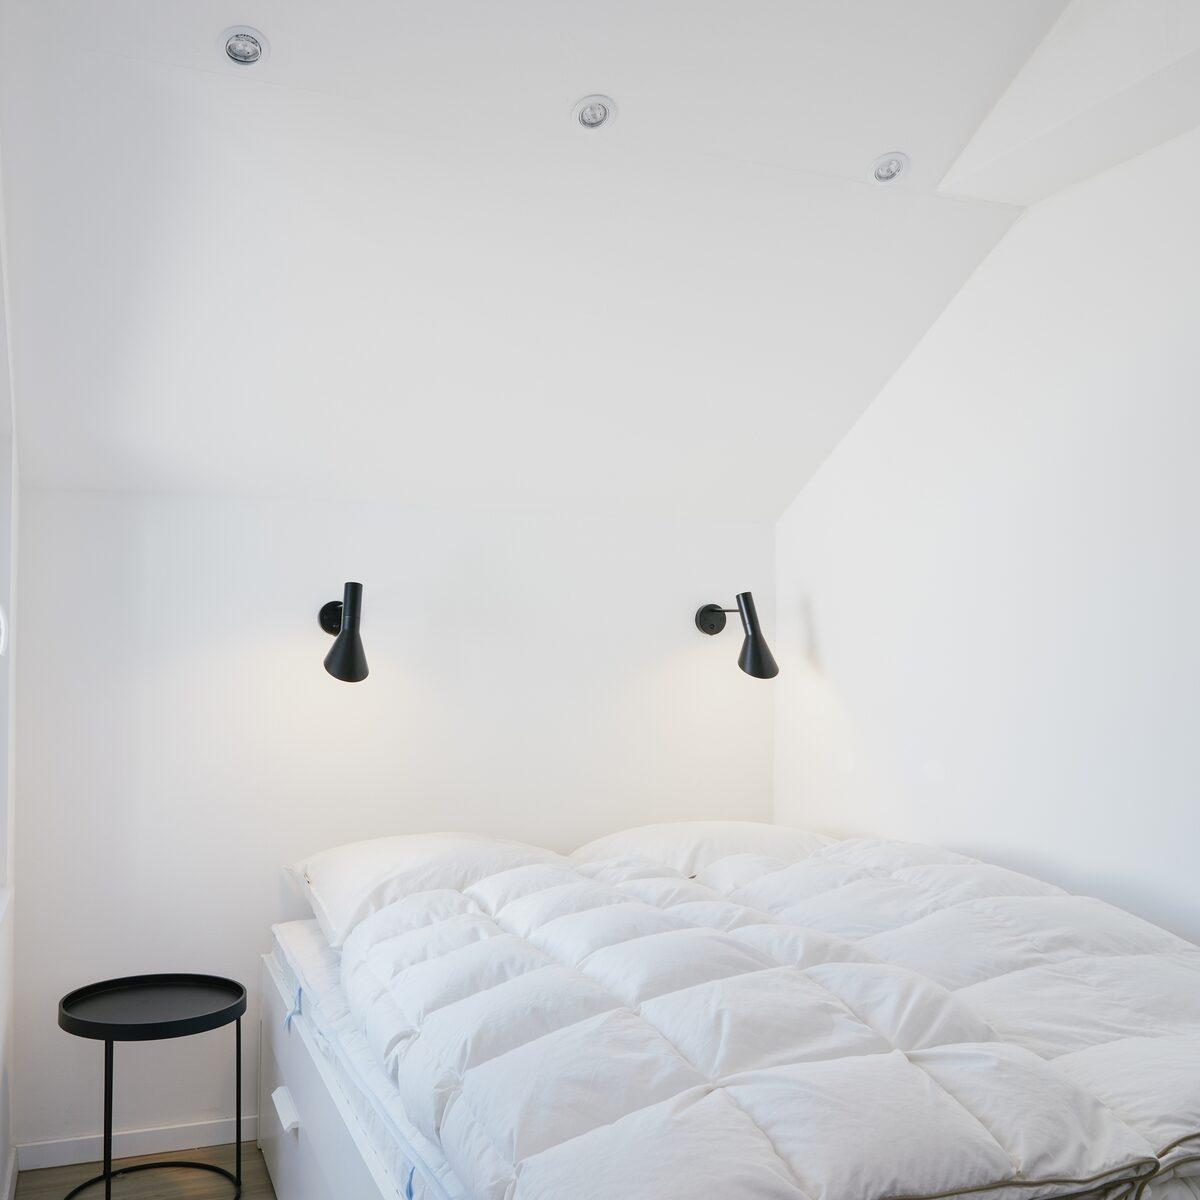 Appartement - Am Waltenberg 70-MG | Winterberg  'Buena Vista'